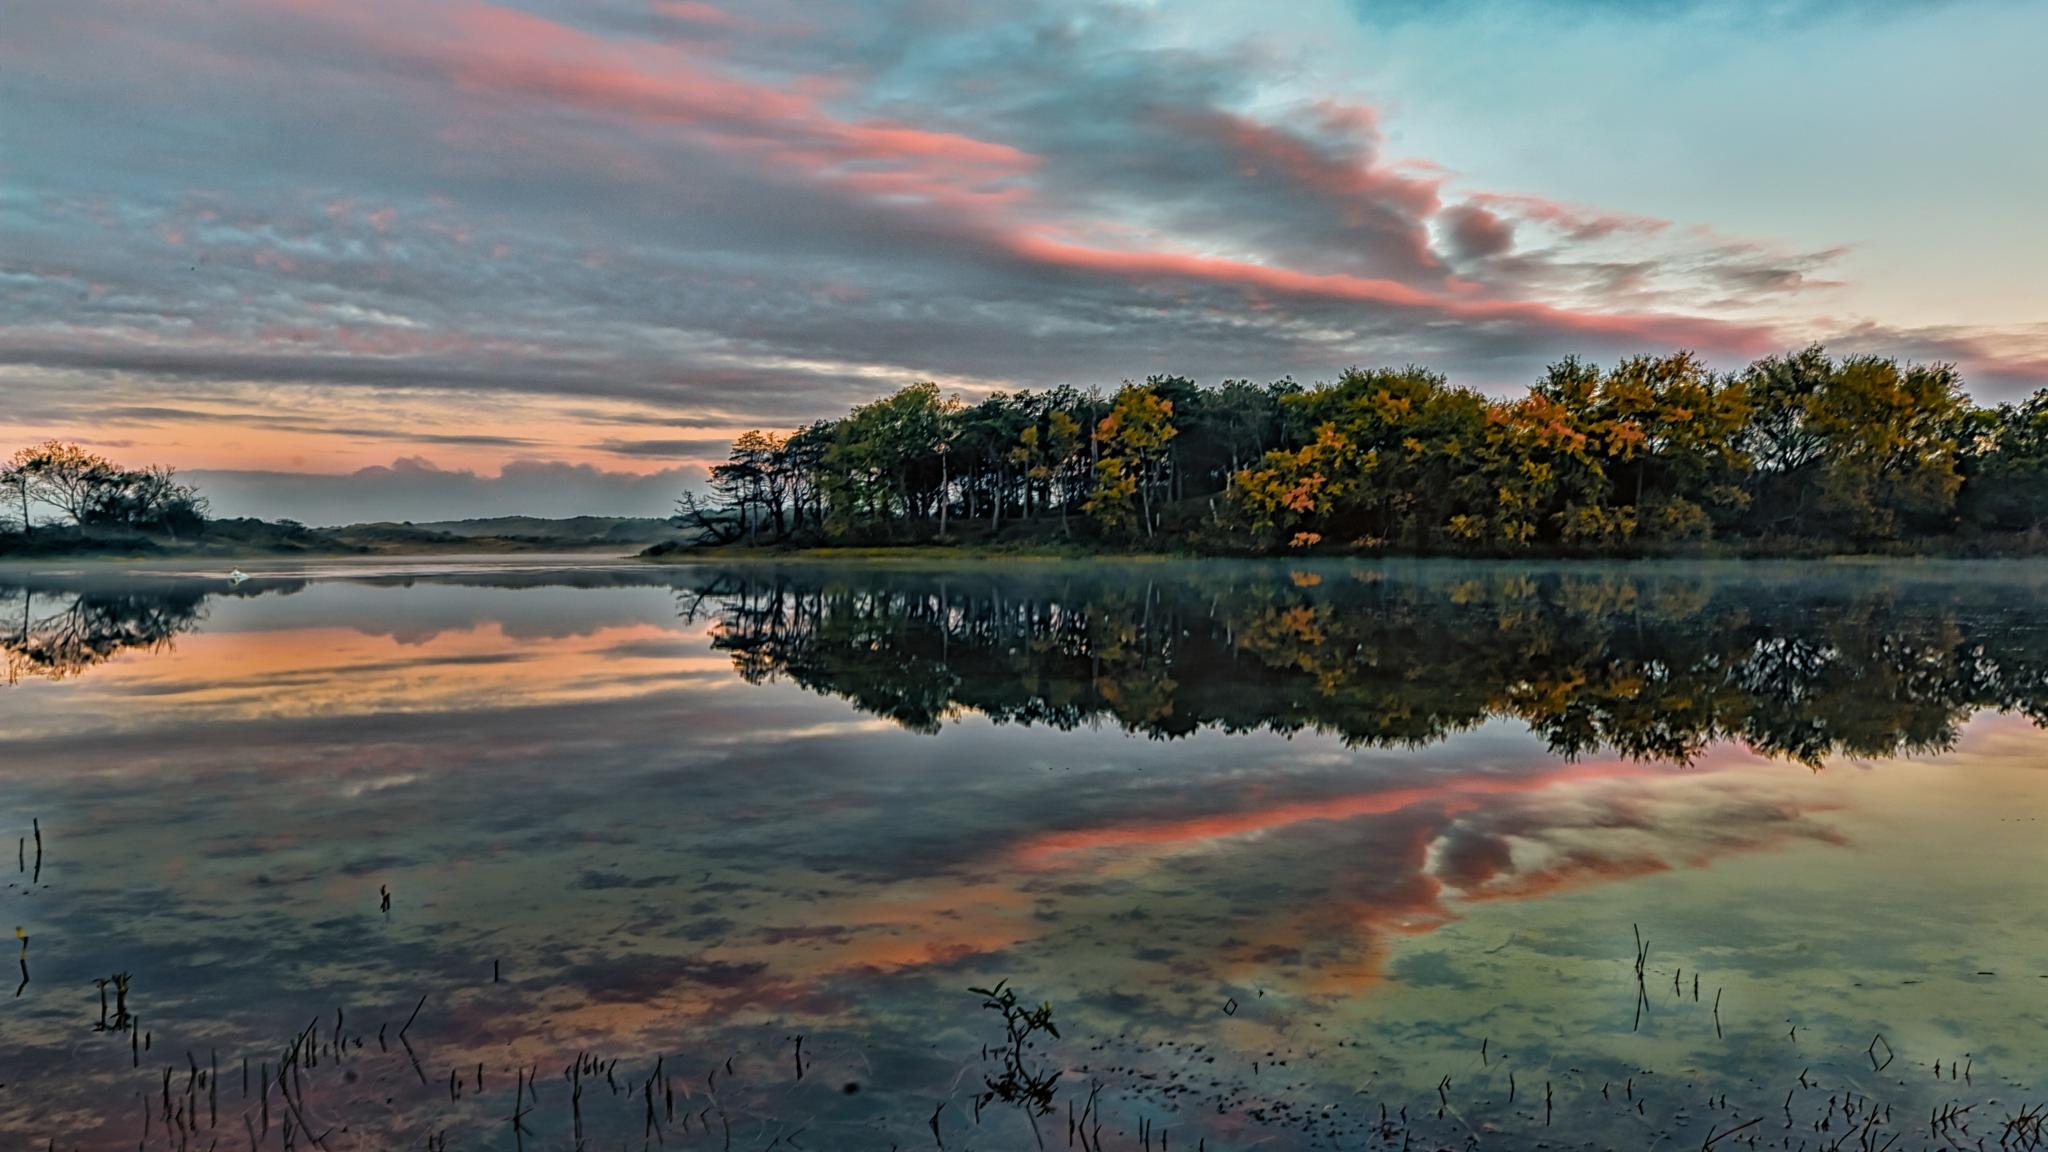 Autumn morning at the lake by FerdinandMul